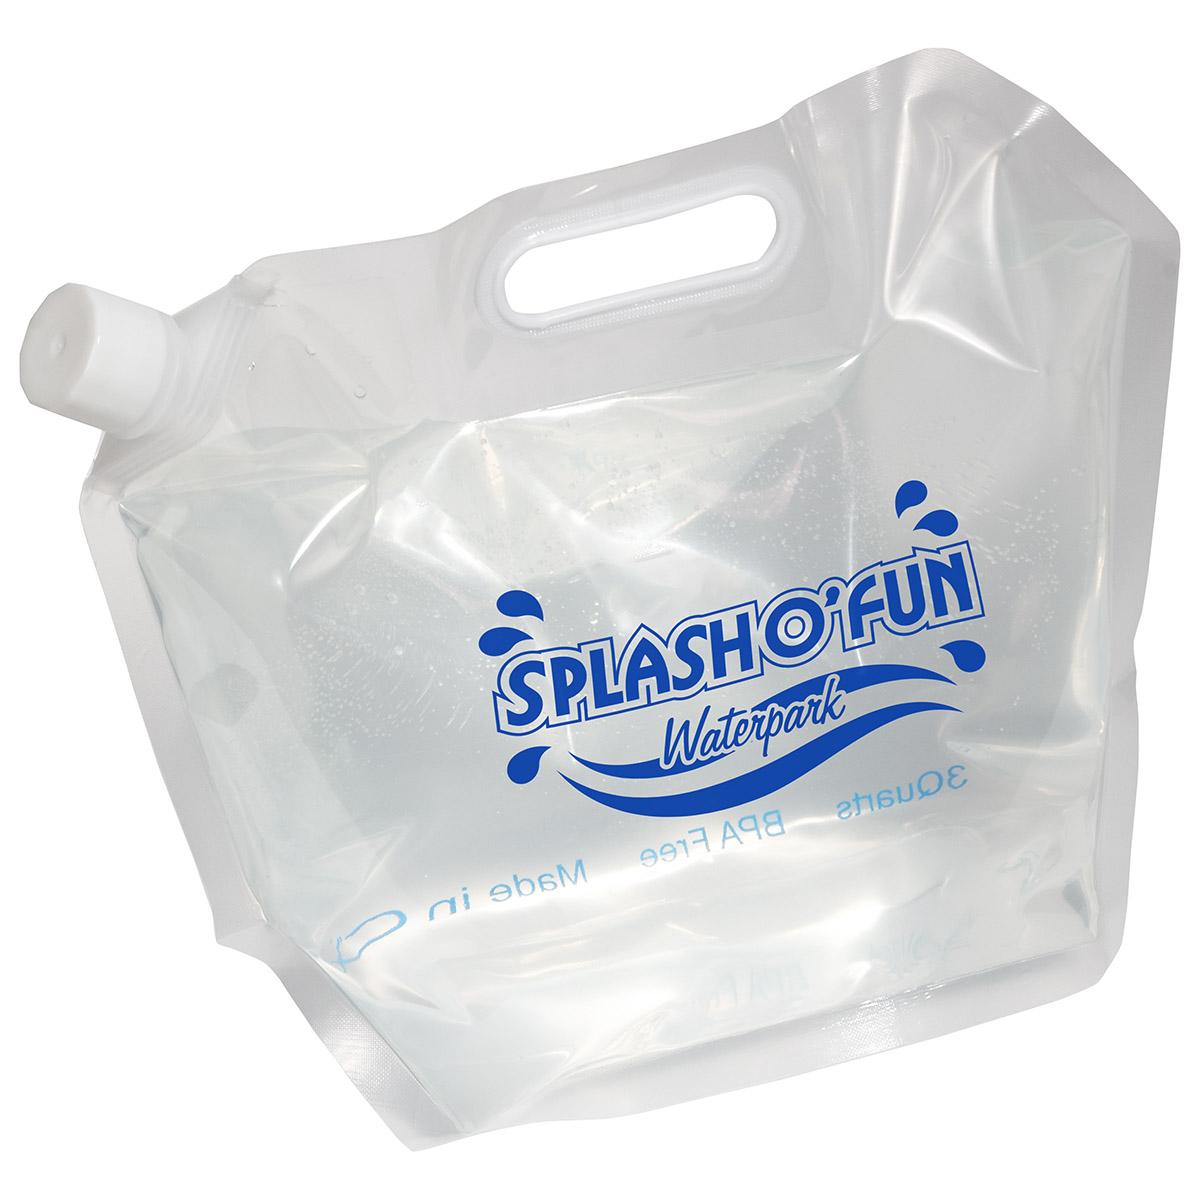 H2o Easy Tote Water Bag, WKA-WB15, 1 Colour Imprint